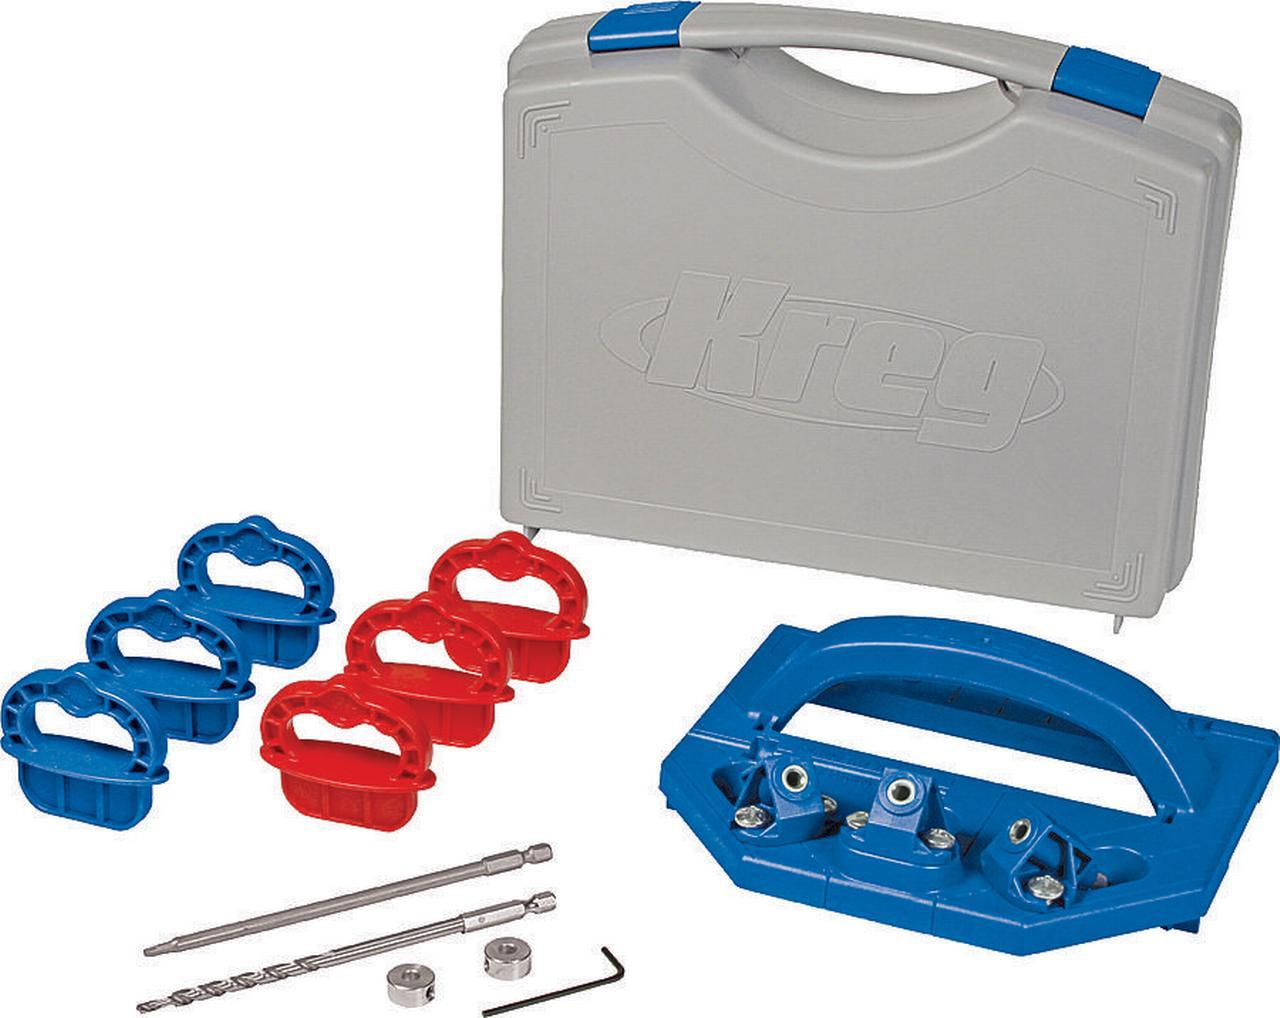 Kreg KJDECKSYS Deck Jig System by Kreg Tool Company